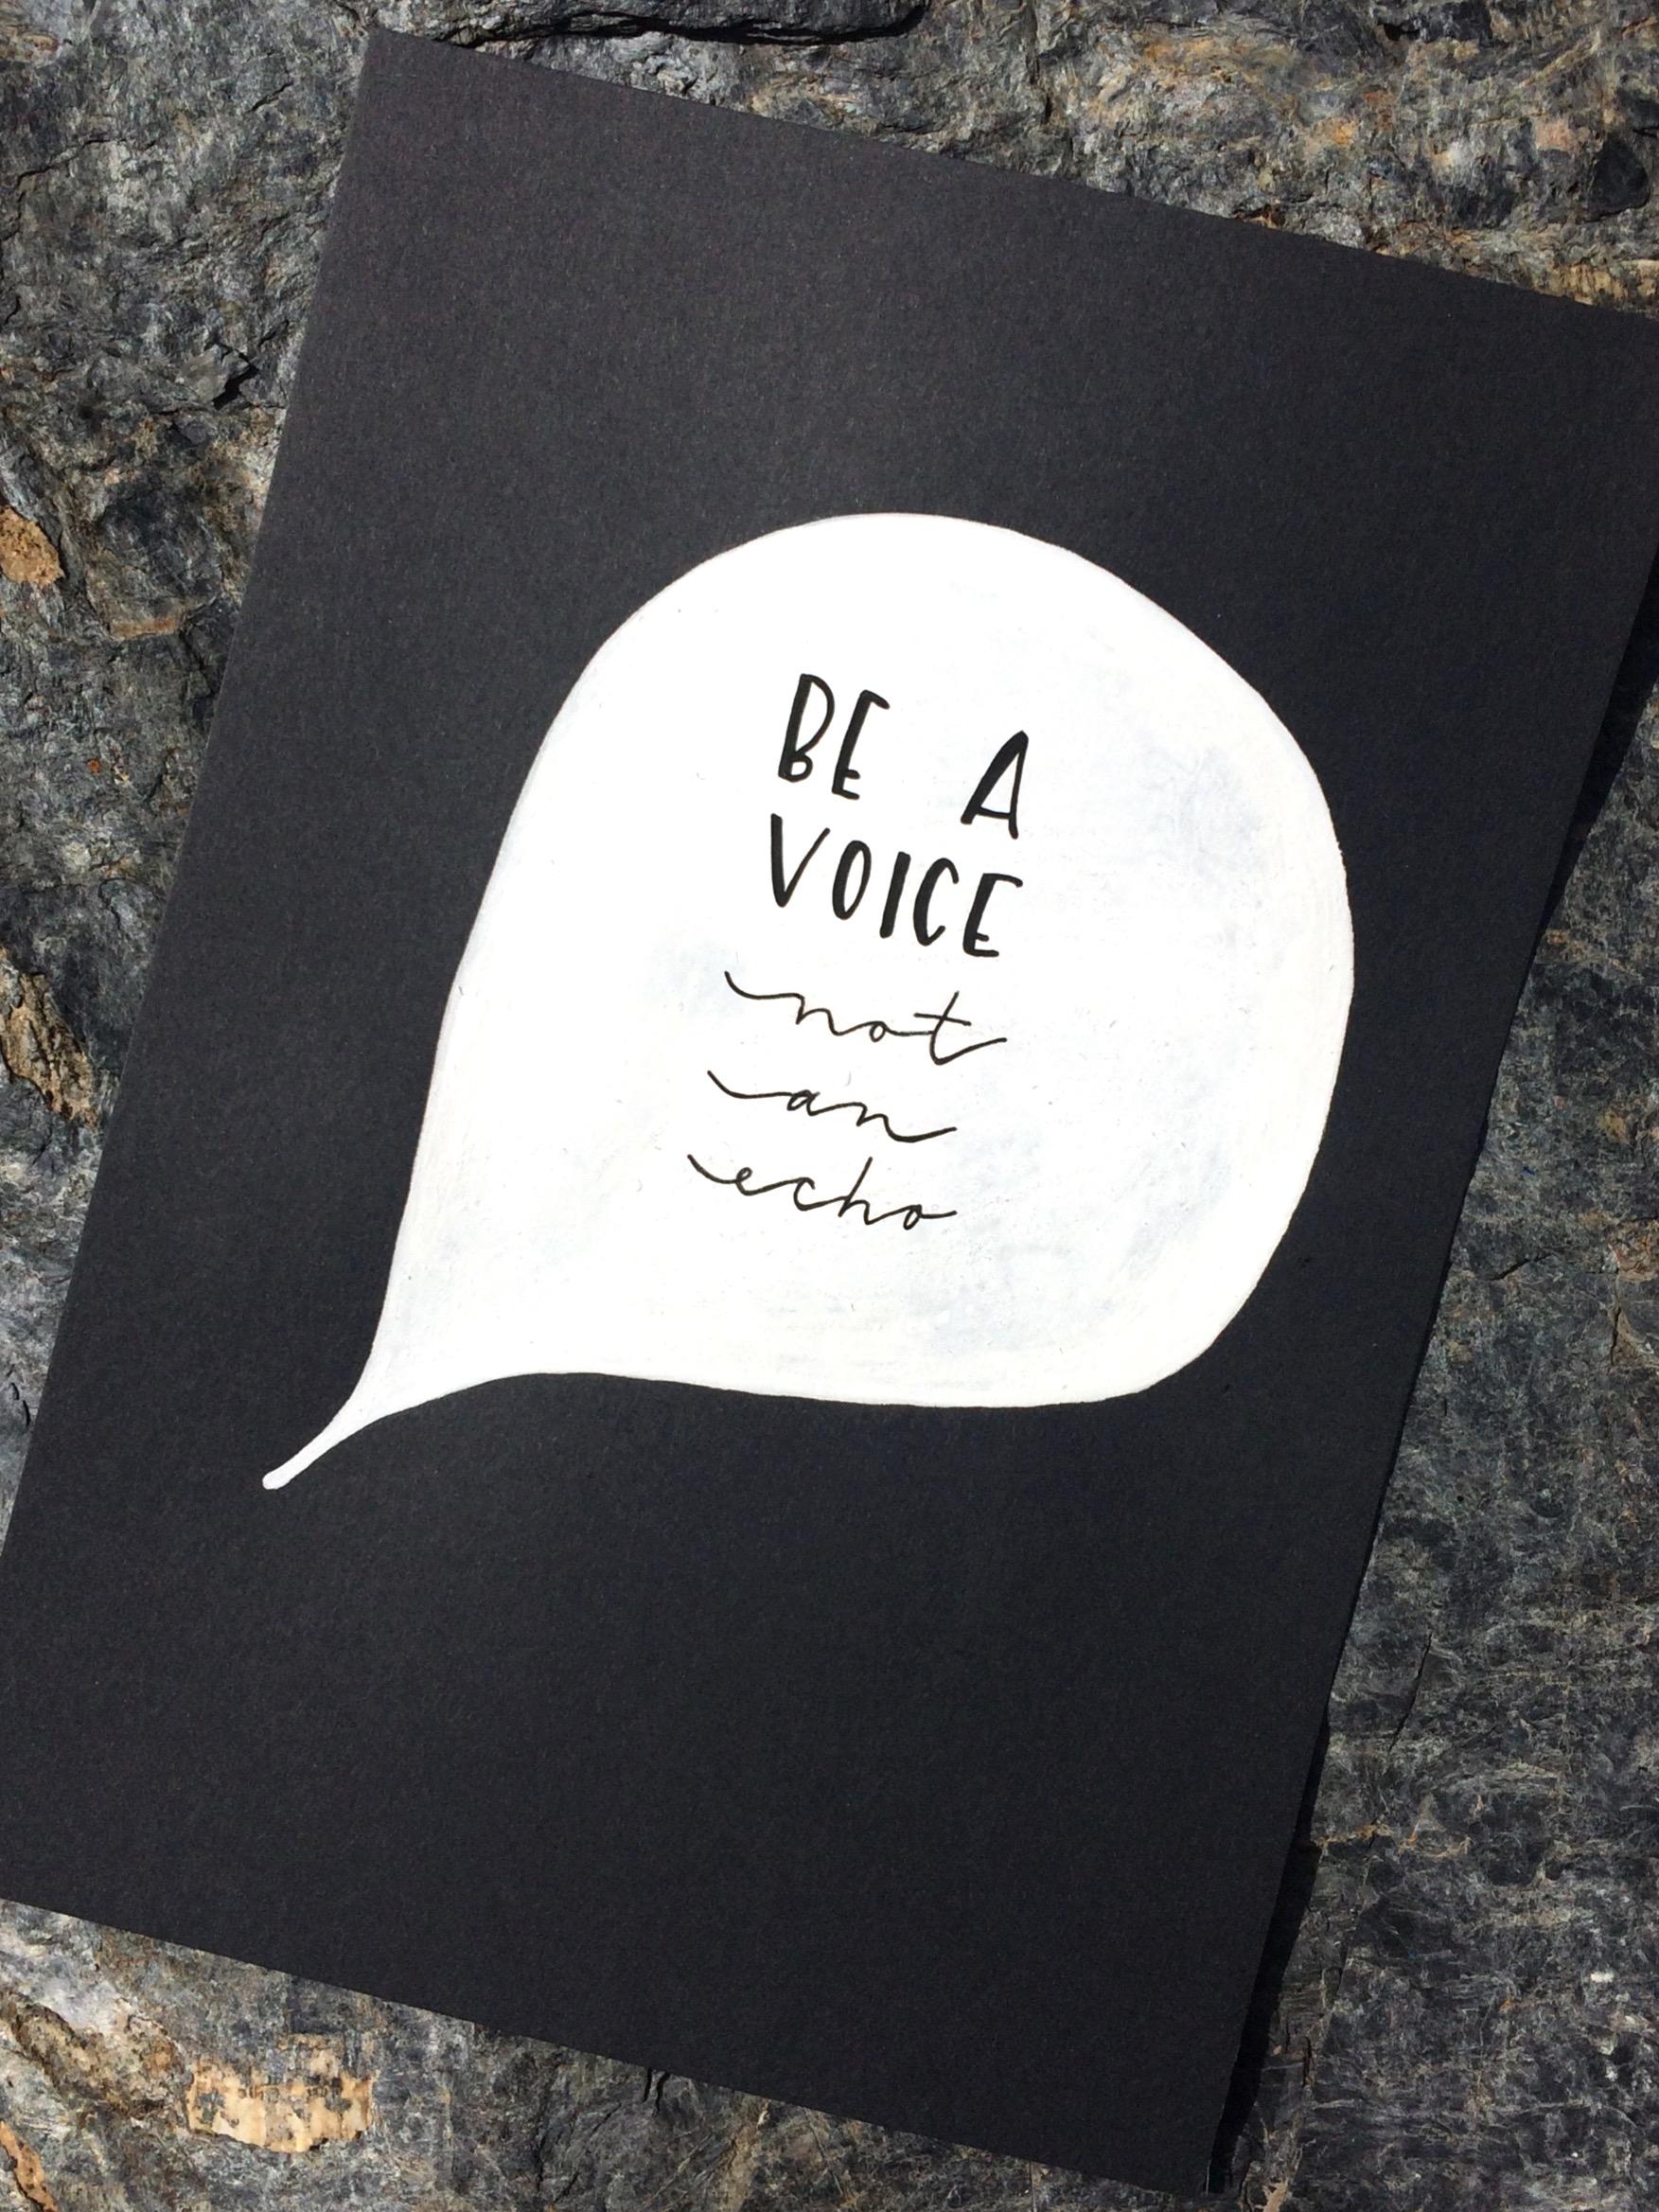 Lettering beavoice